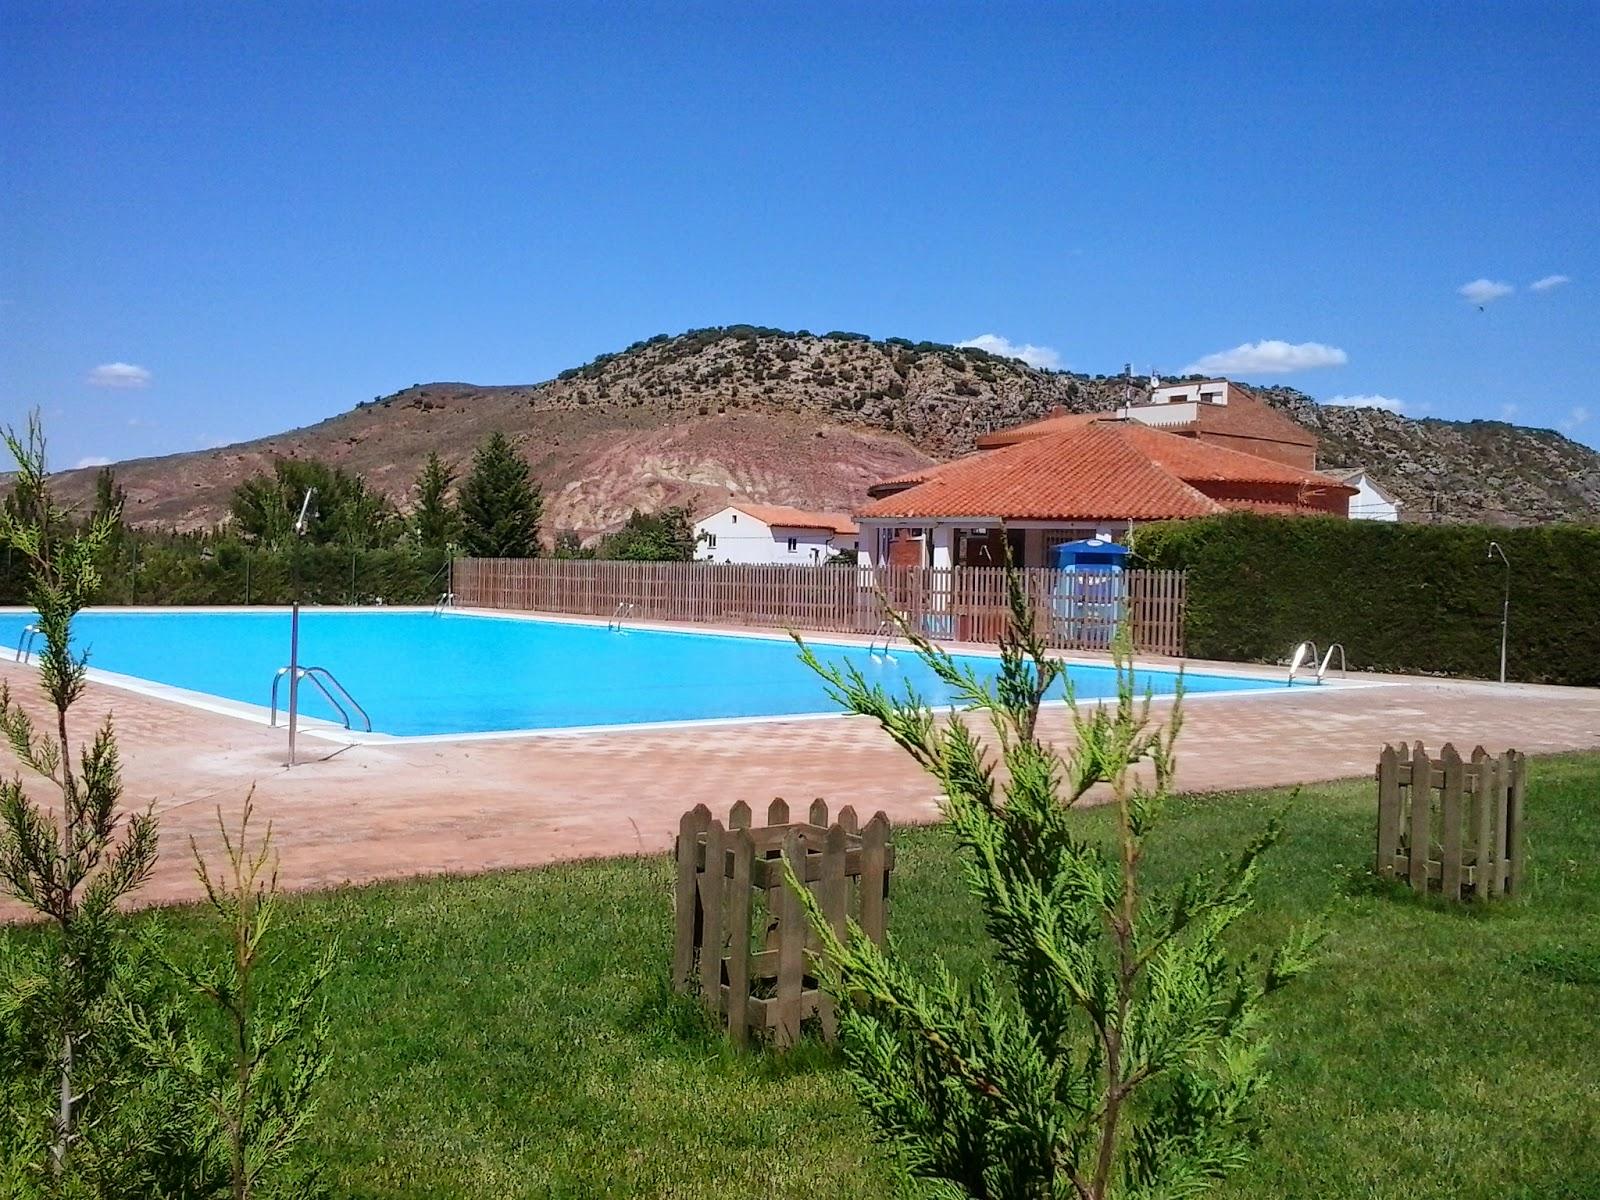 El jueves abre la piscina municipal noticias de manzanera for Piscina municipal